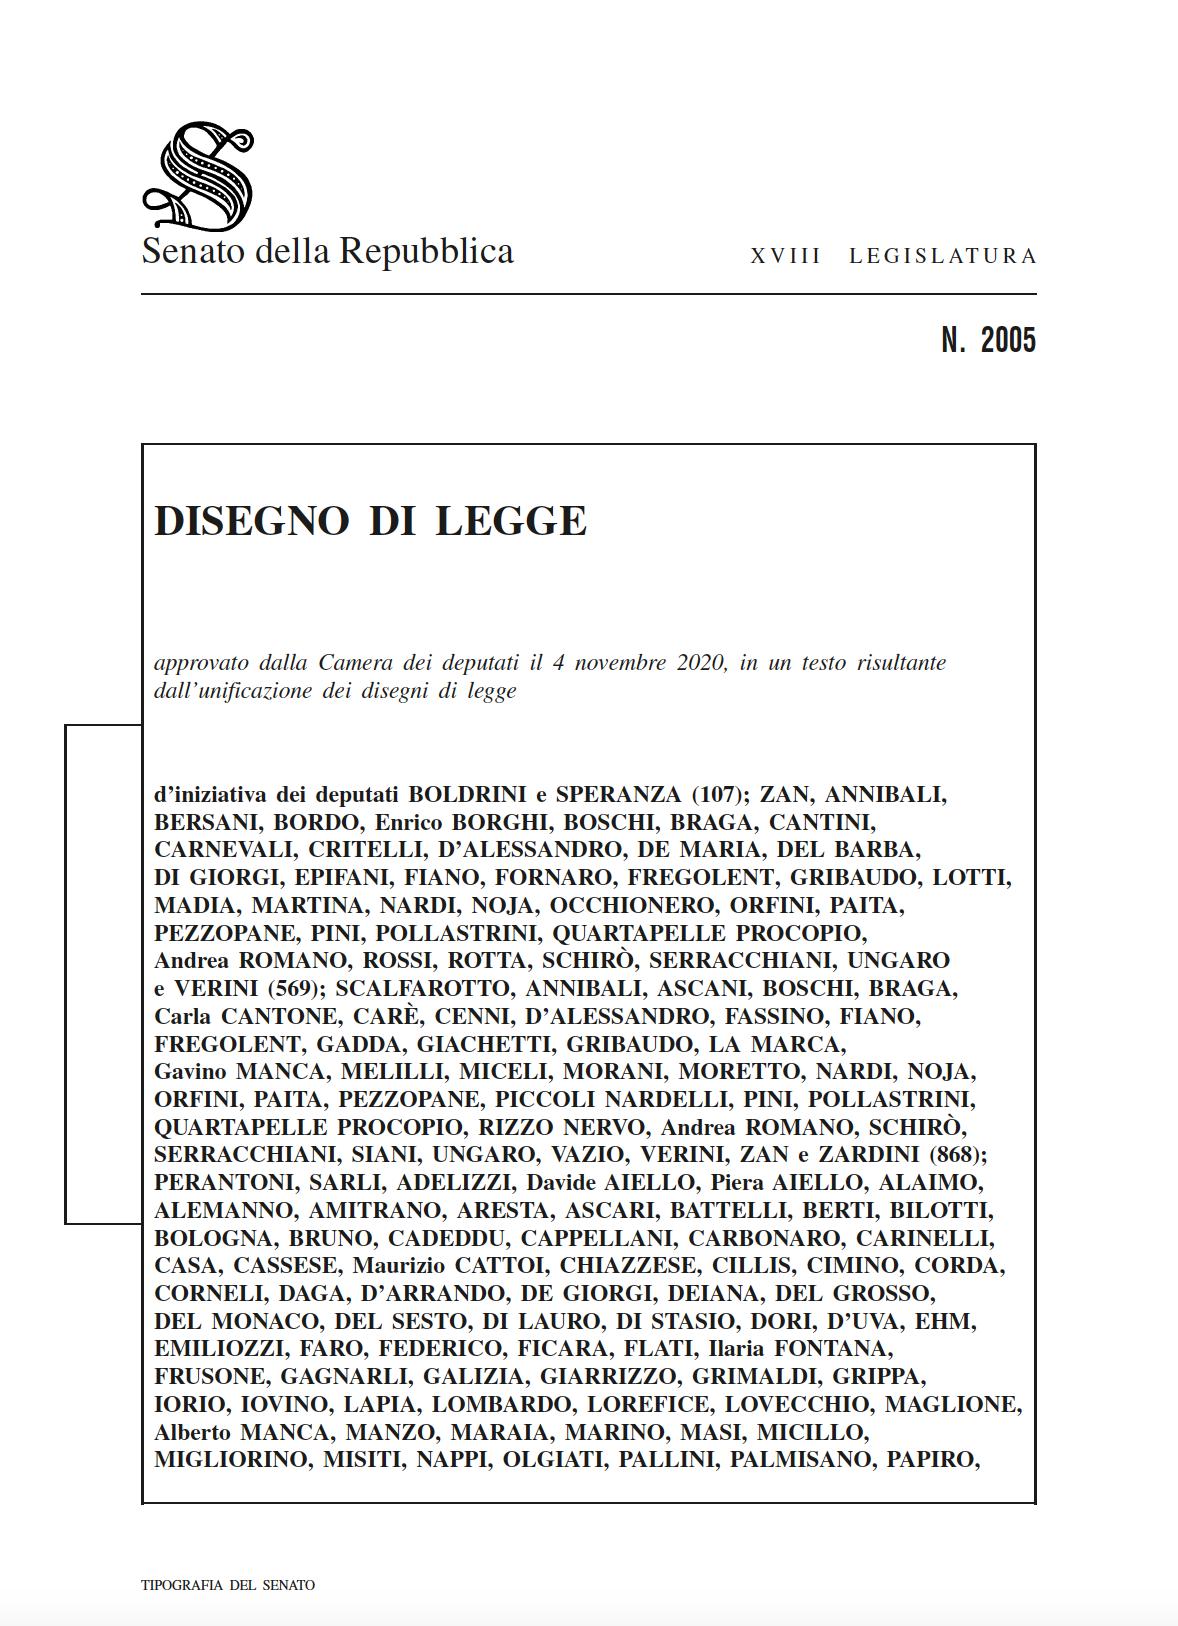 Ddl Zan testo completo PDF